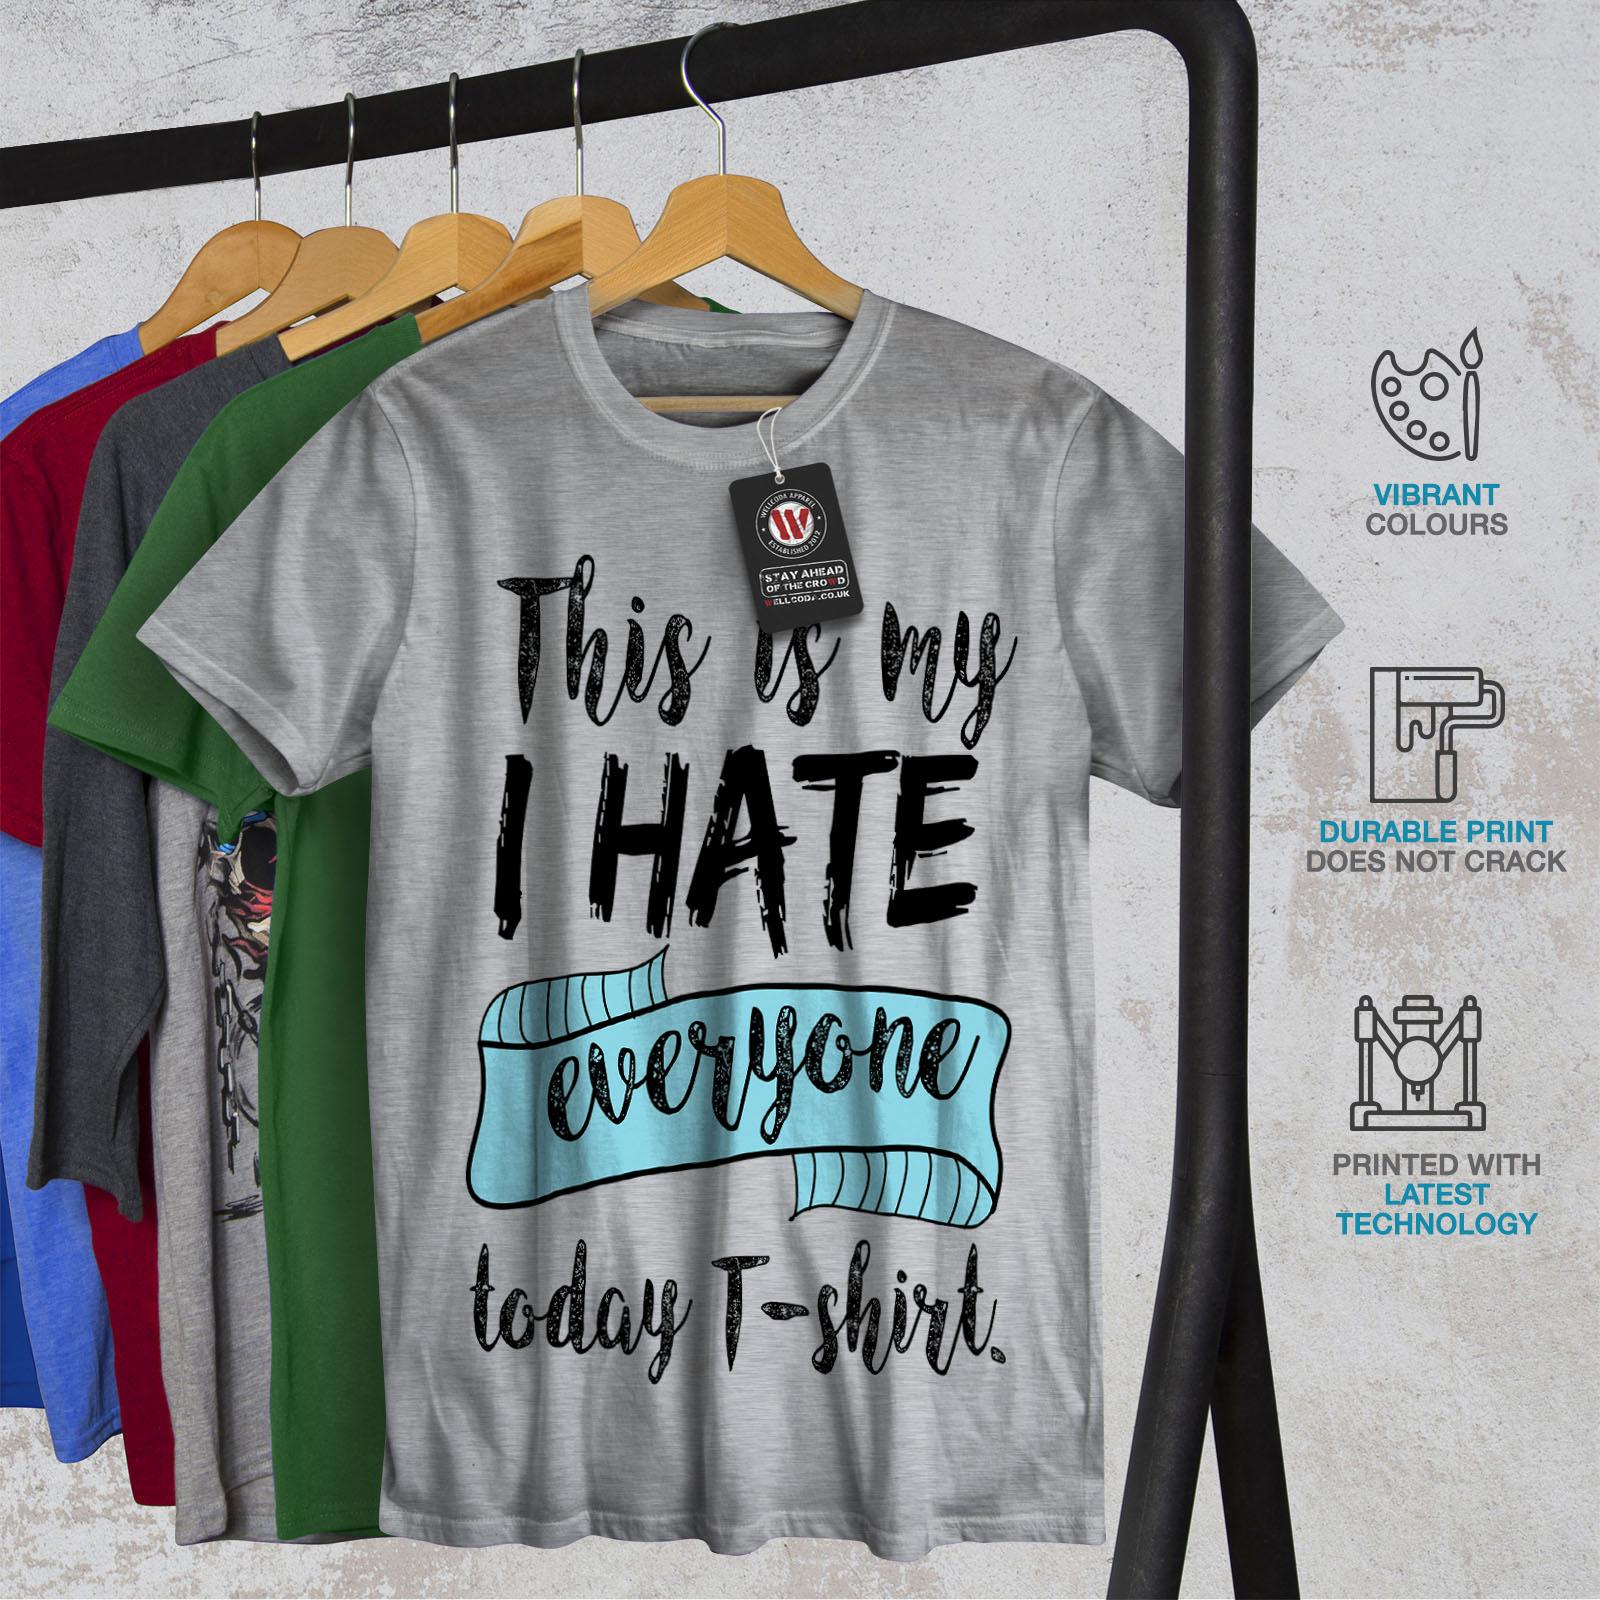 Wellcoda-hasse-alle-heute-Herren-T-Shirt-lustige-Grafikdesign-Printed-Tee Indexbild 18